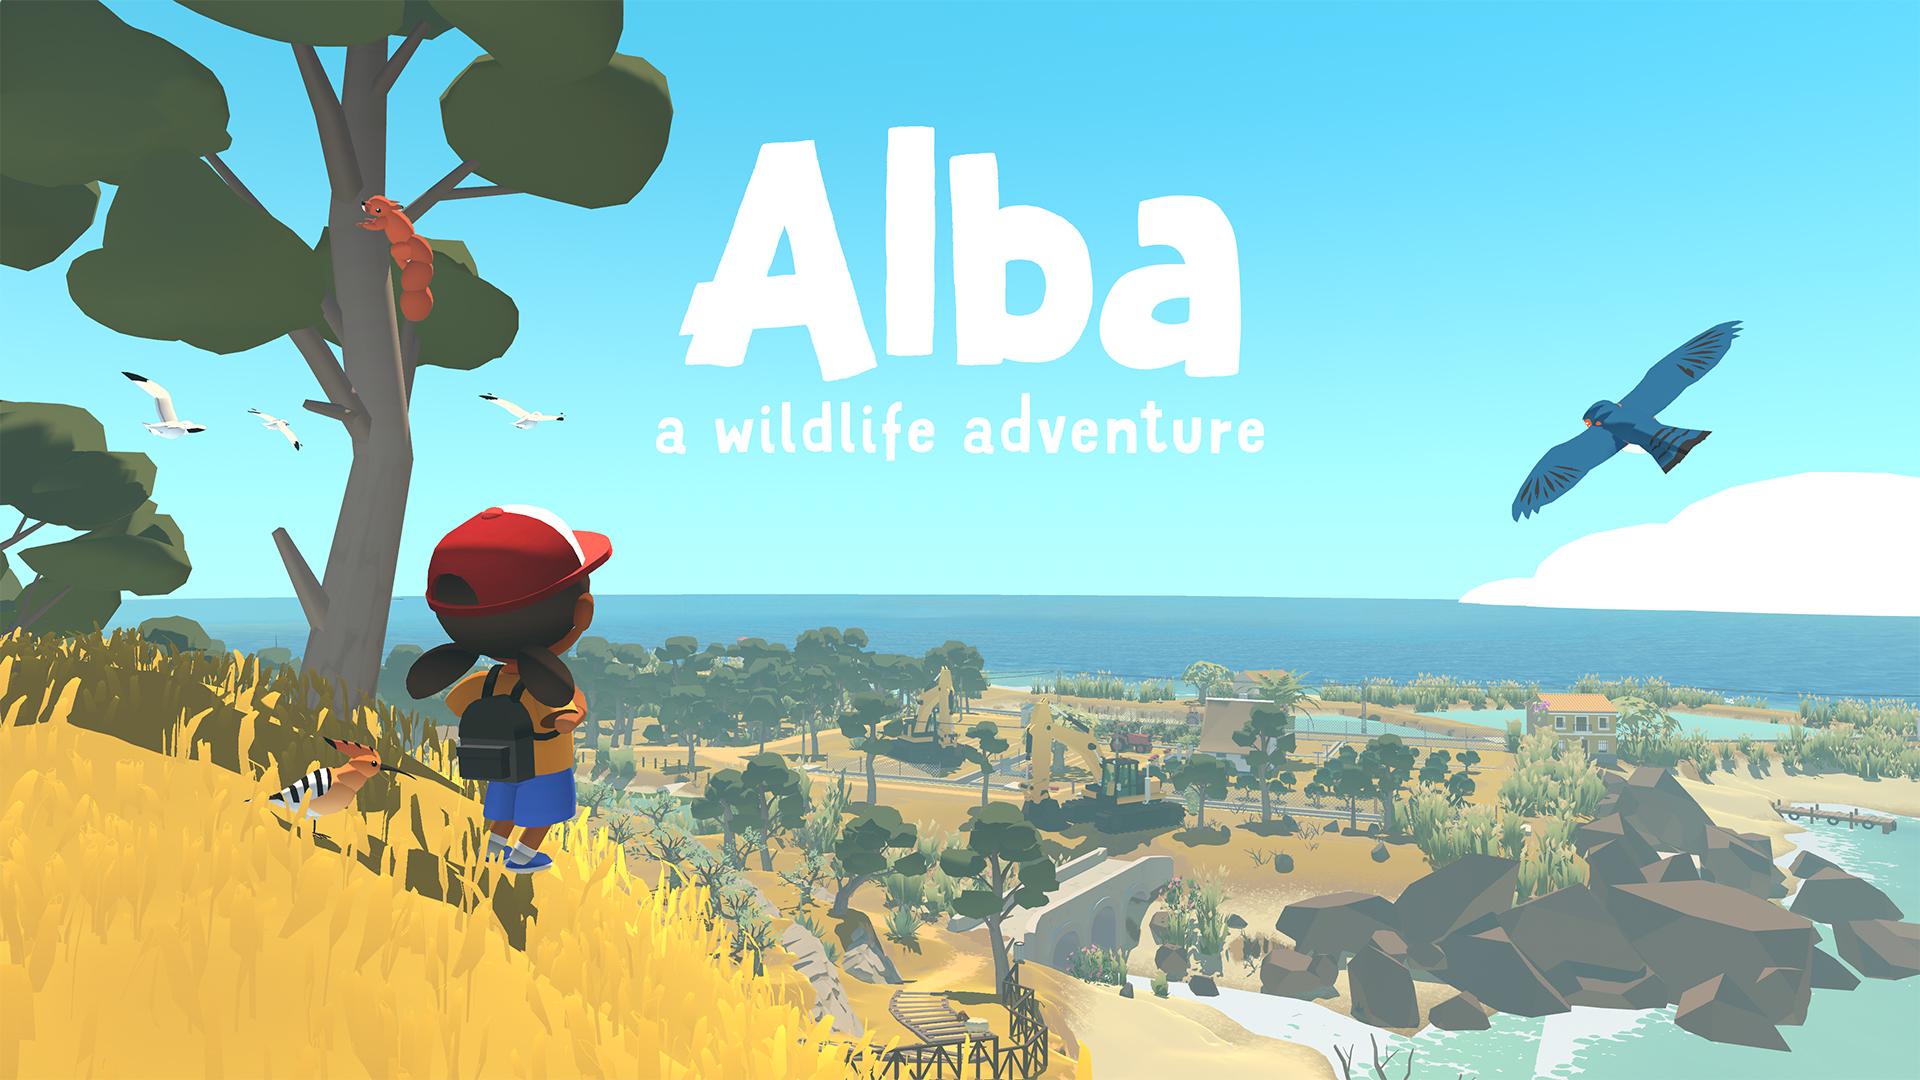 alba a wildlife adventure video game wallpaper 72924